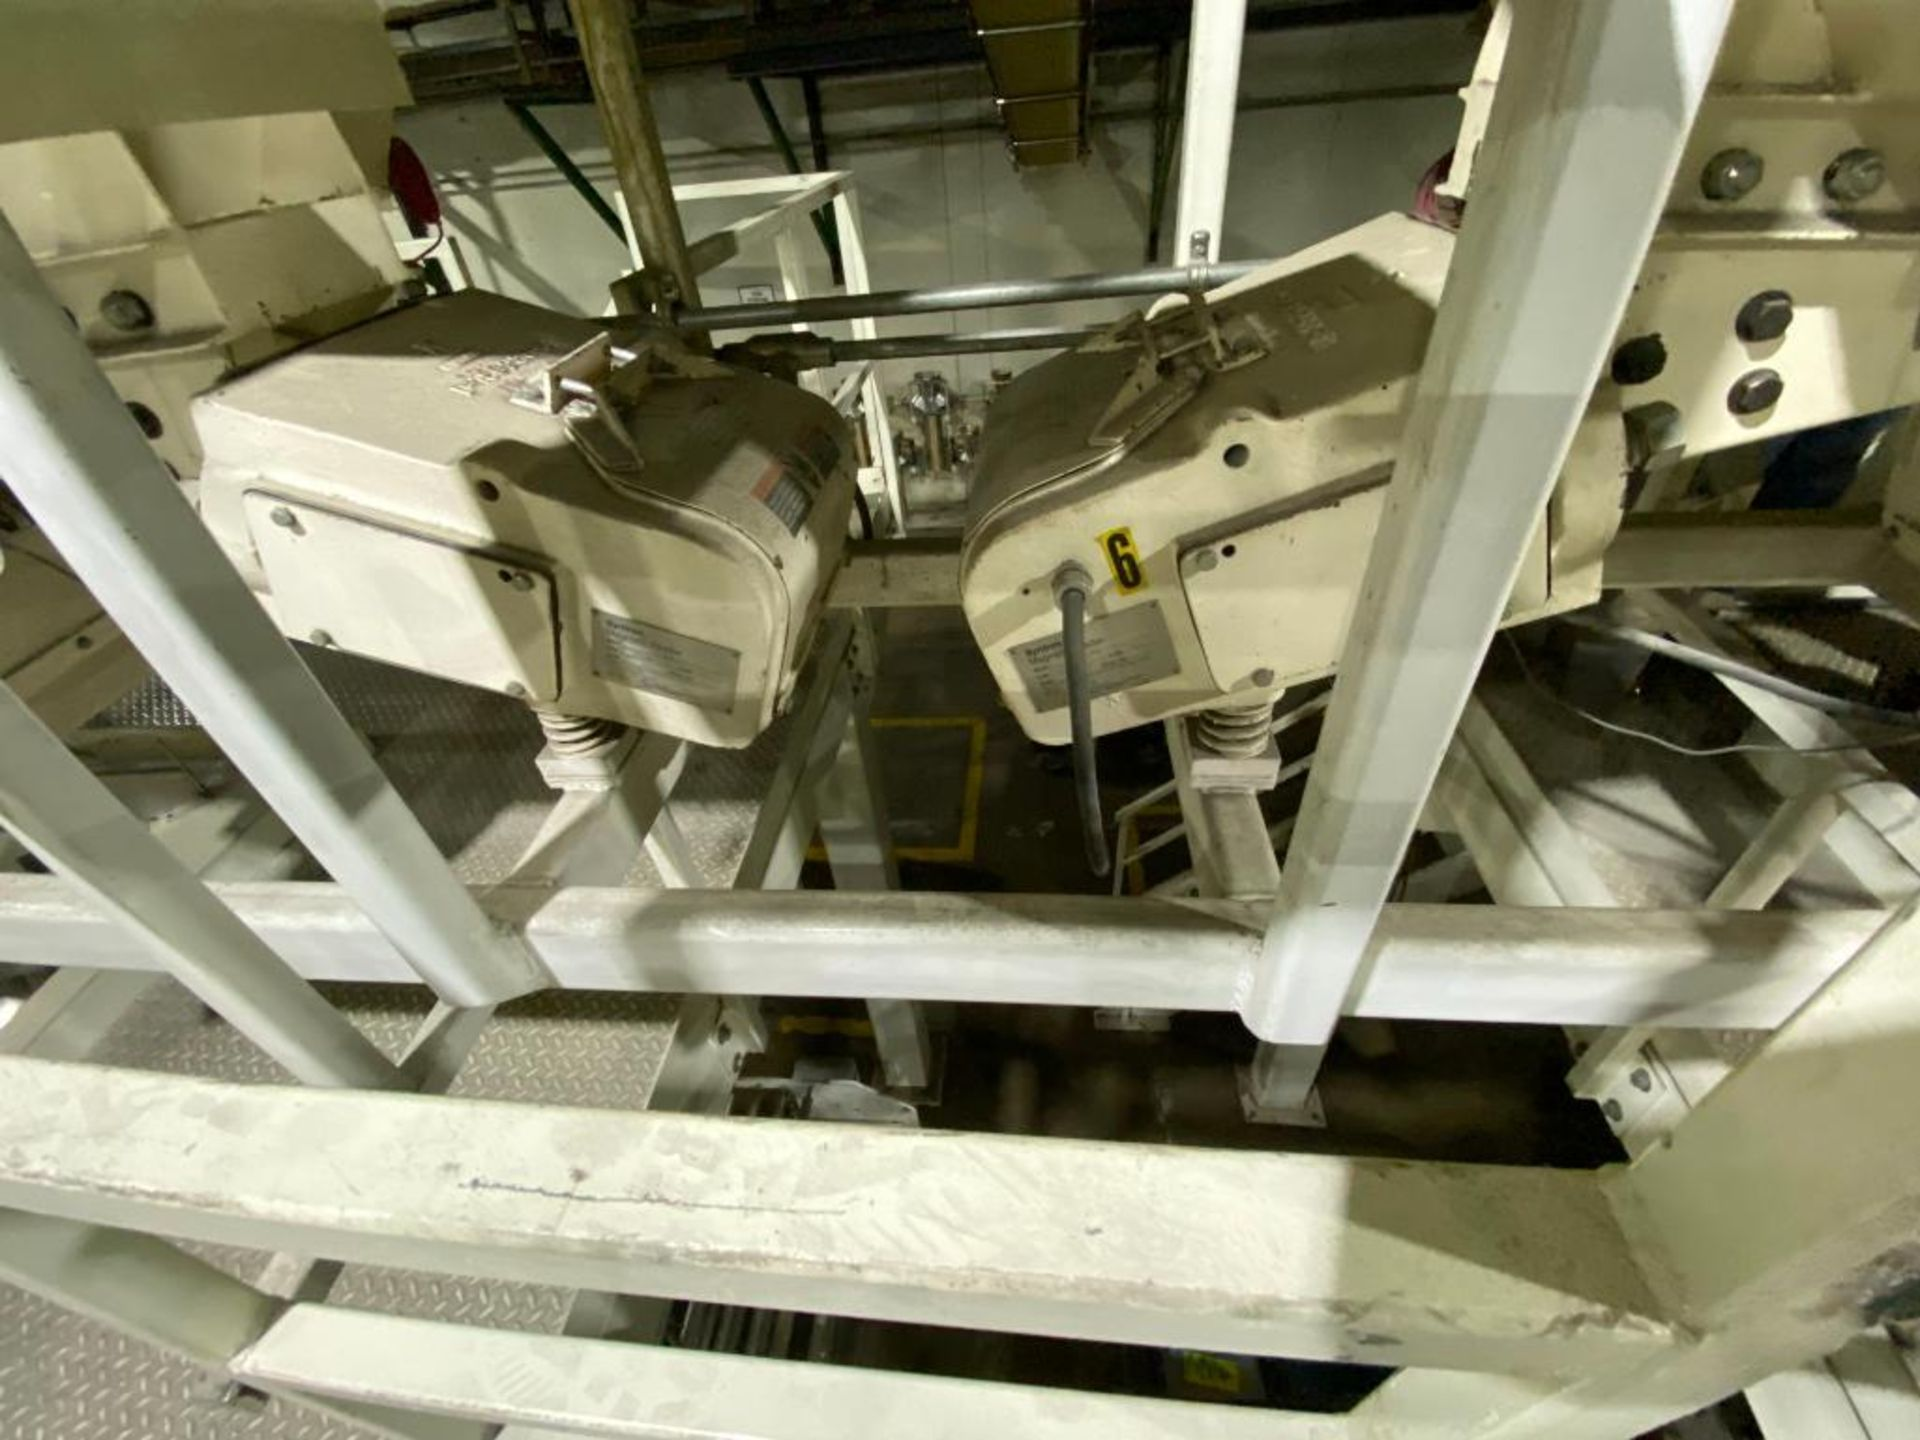 Aseeco bulk accumulation bin - Image 7 of 13